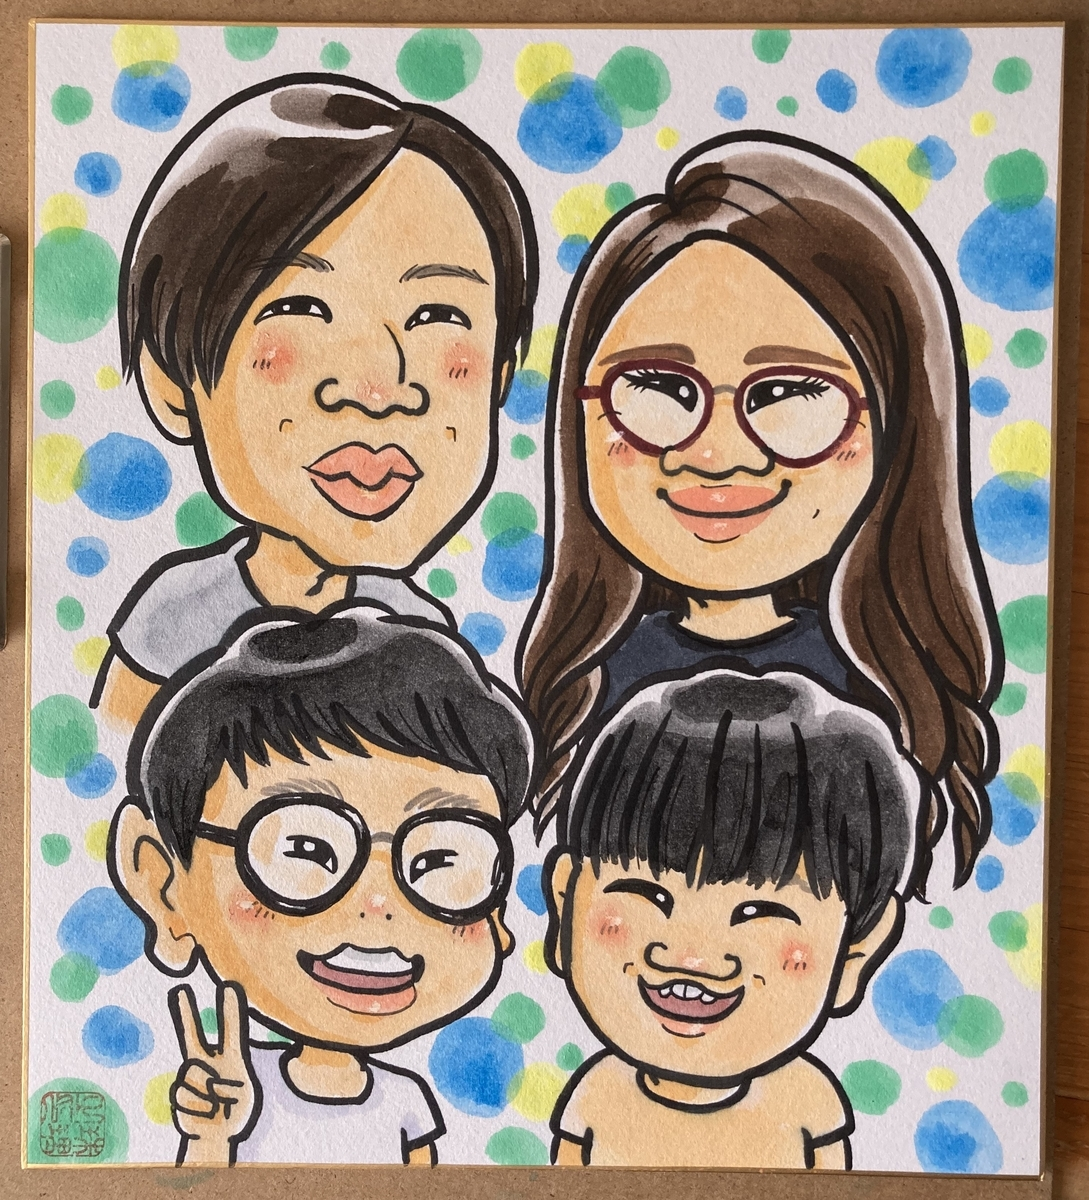 家族4人の似顔絵